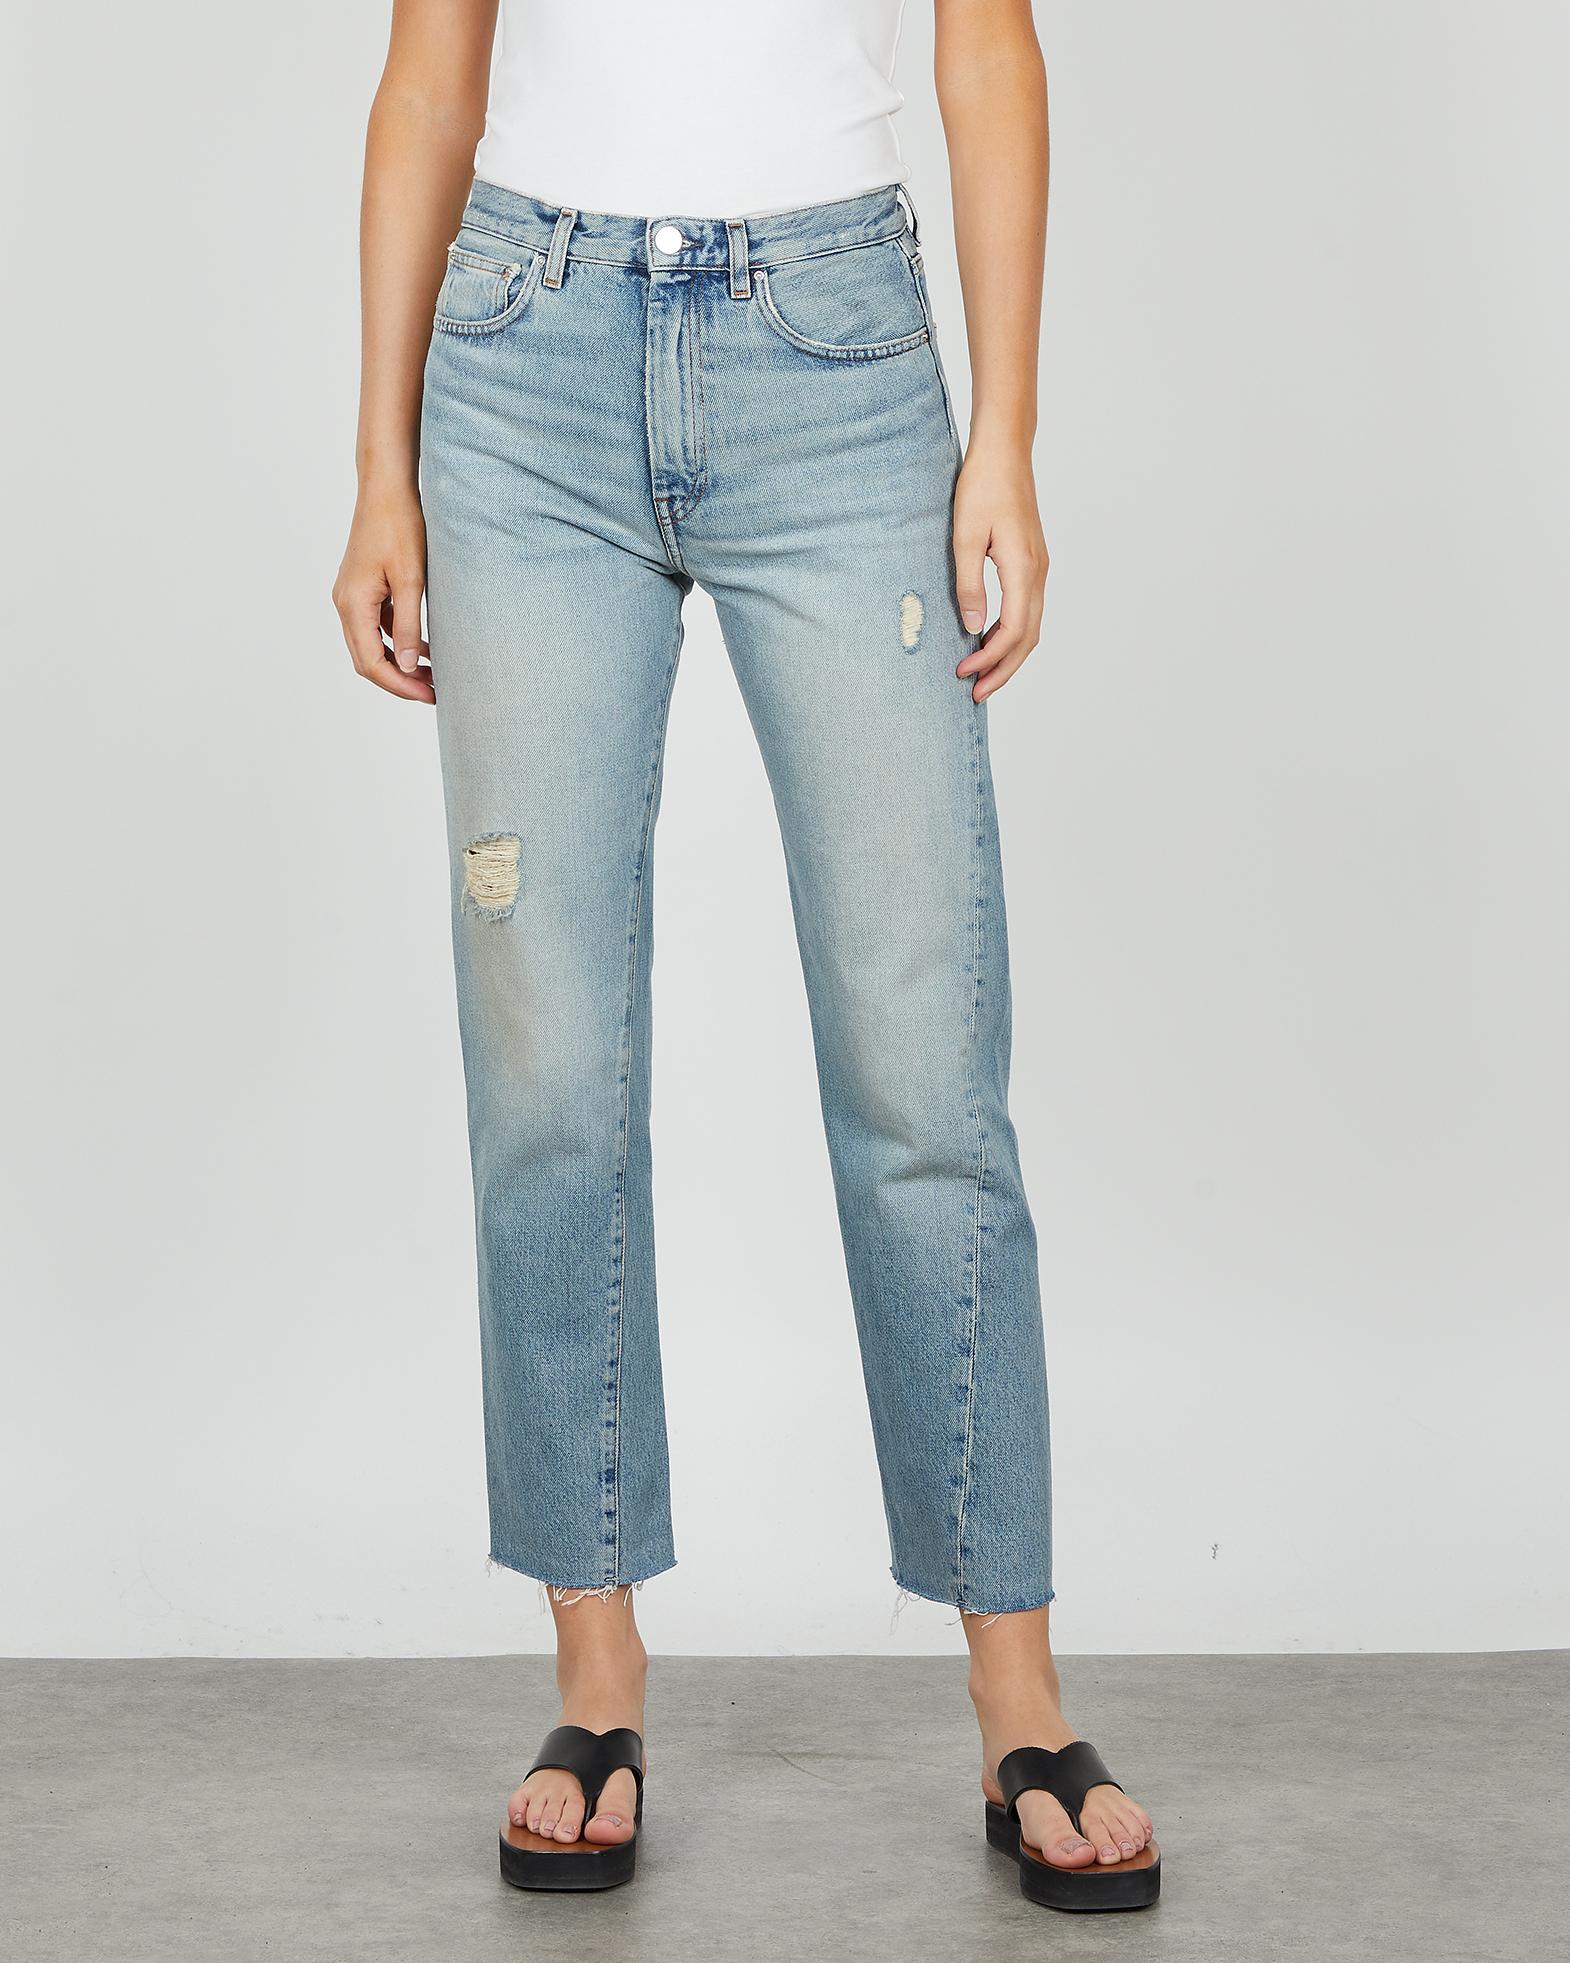 Totême Jeans Twisted Seam blå 23/32